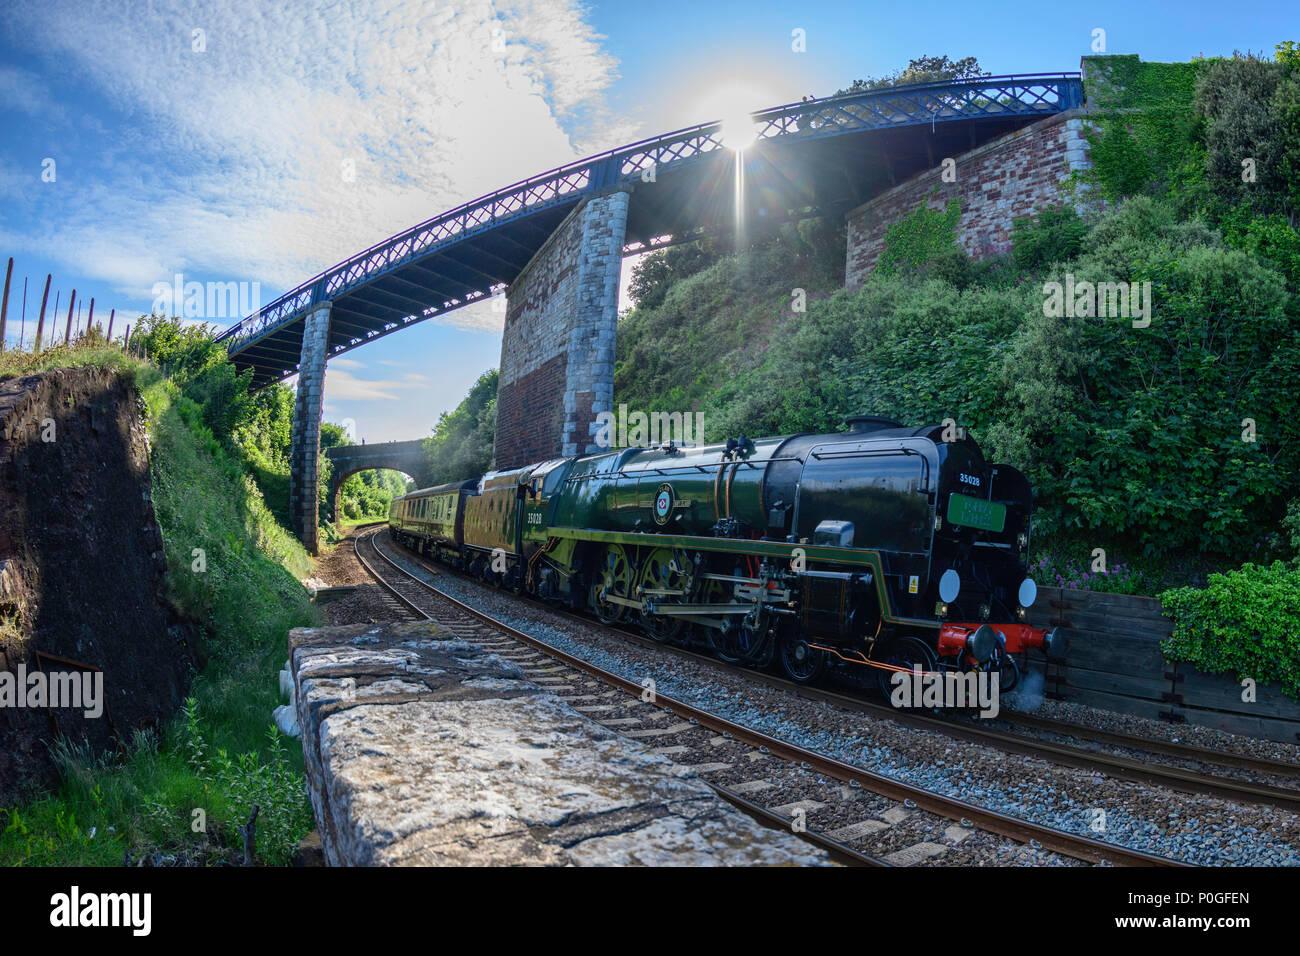 Fisheye effect photo. Steam locomotive 35028 Clan Line passes skew bridge Teignmouth south Devon UK - Stock Image